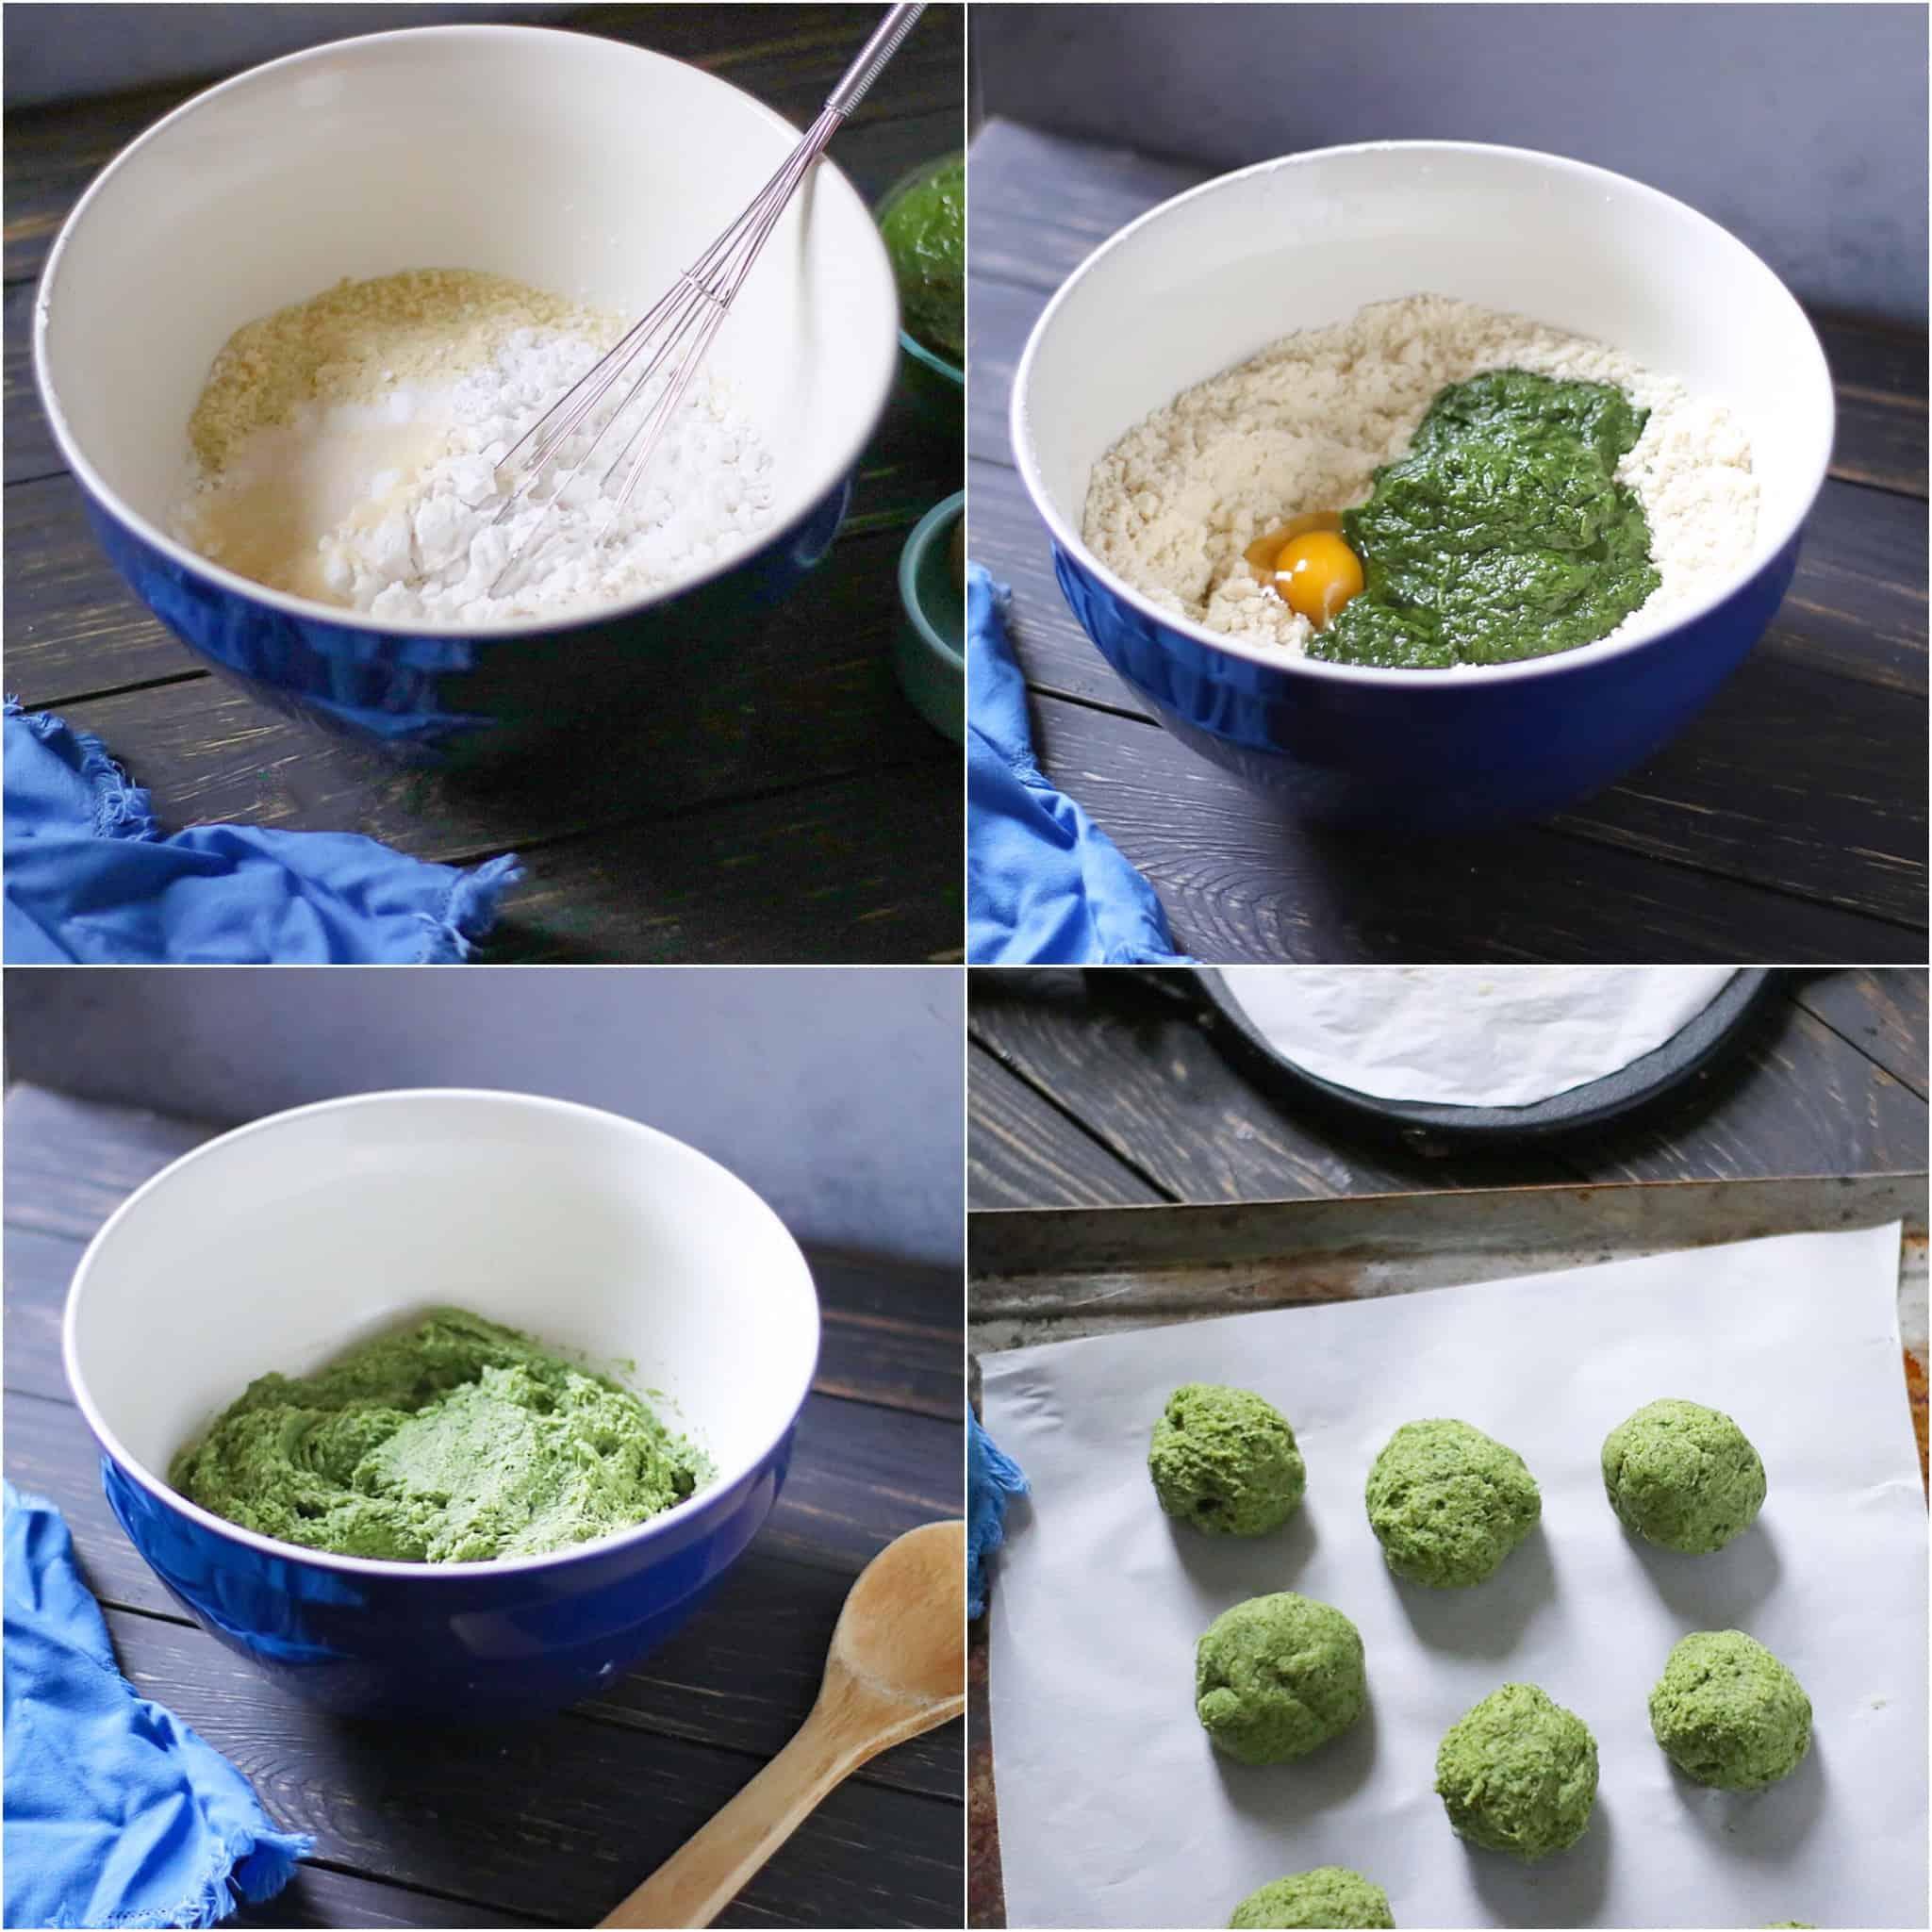 Tortilla wk 1